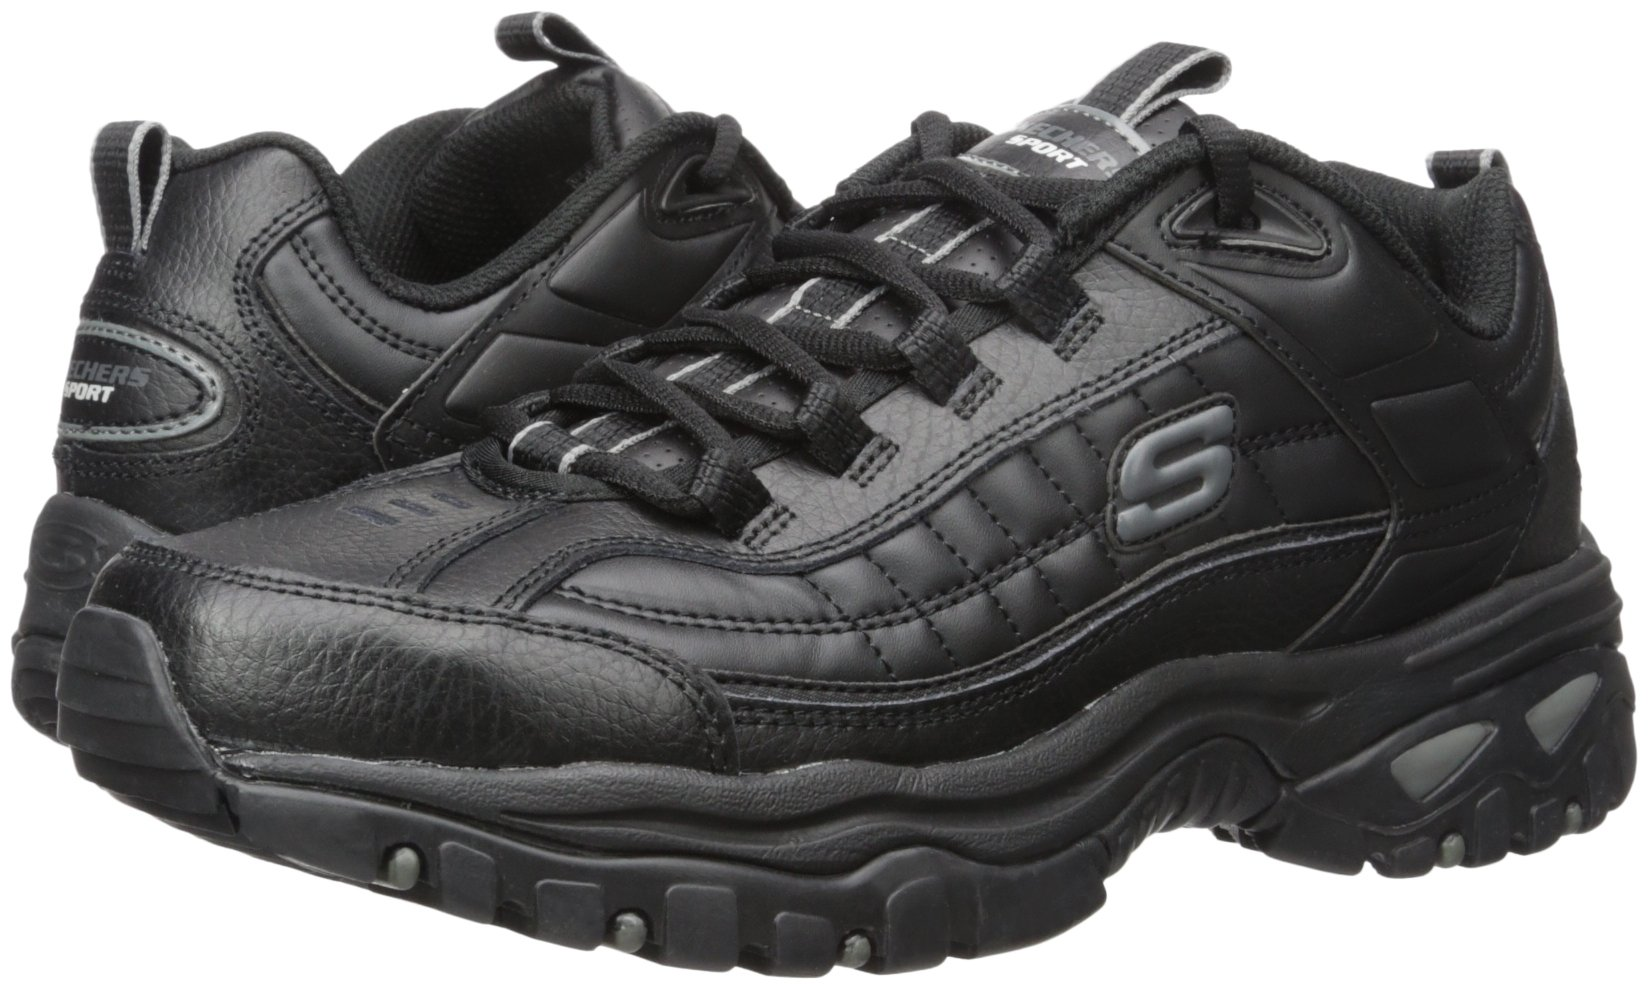 Skechers Sport Men's Energy Afterburn Lace-Up Sneaker,Black,13 M by Skechers (Image #6)